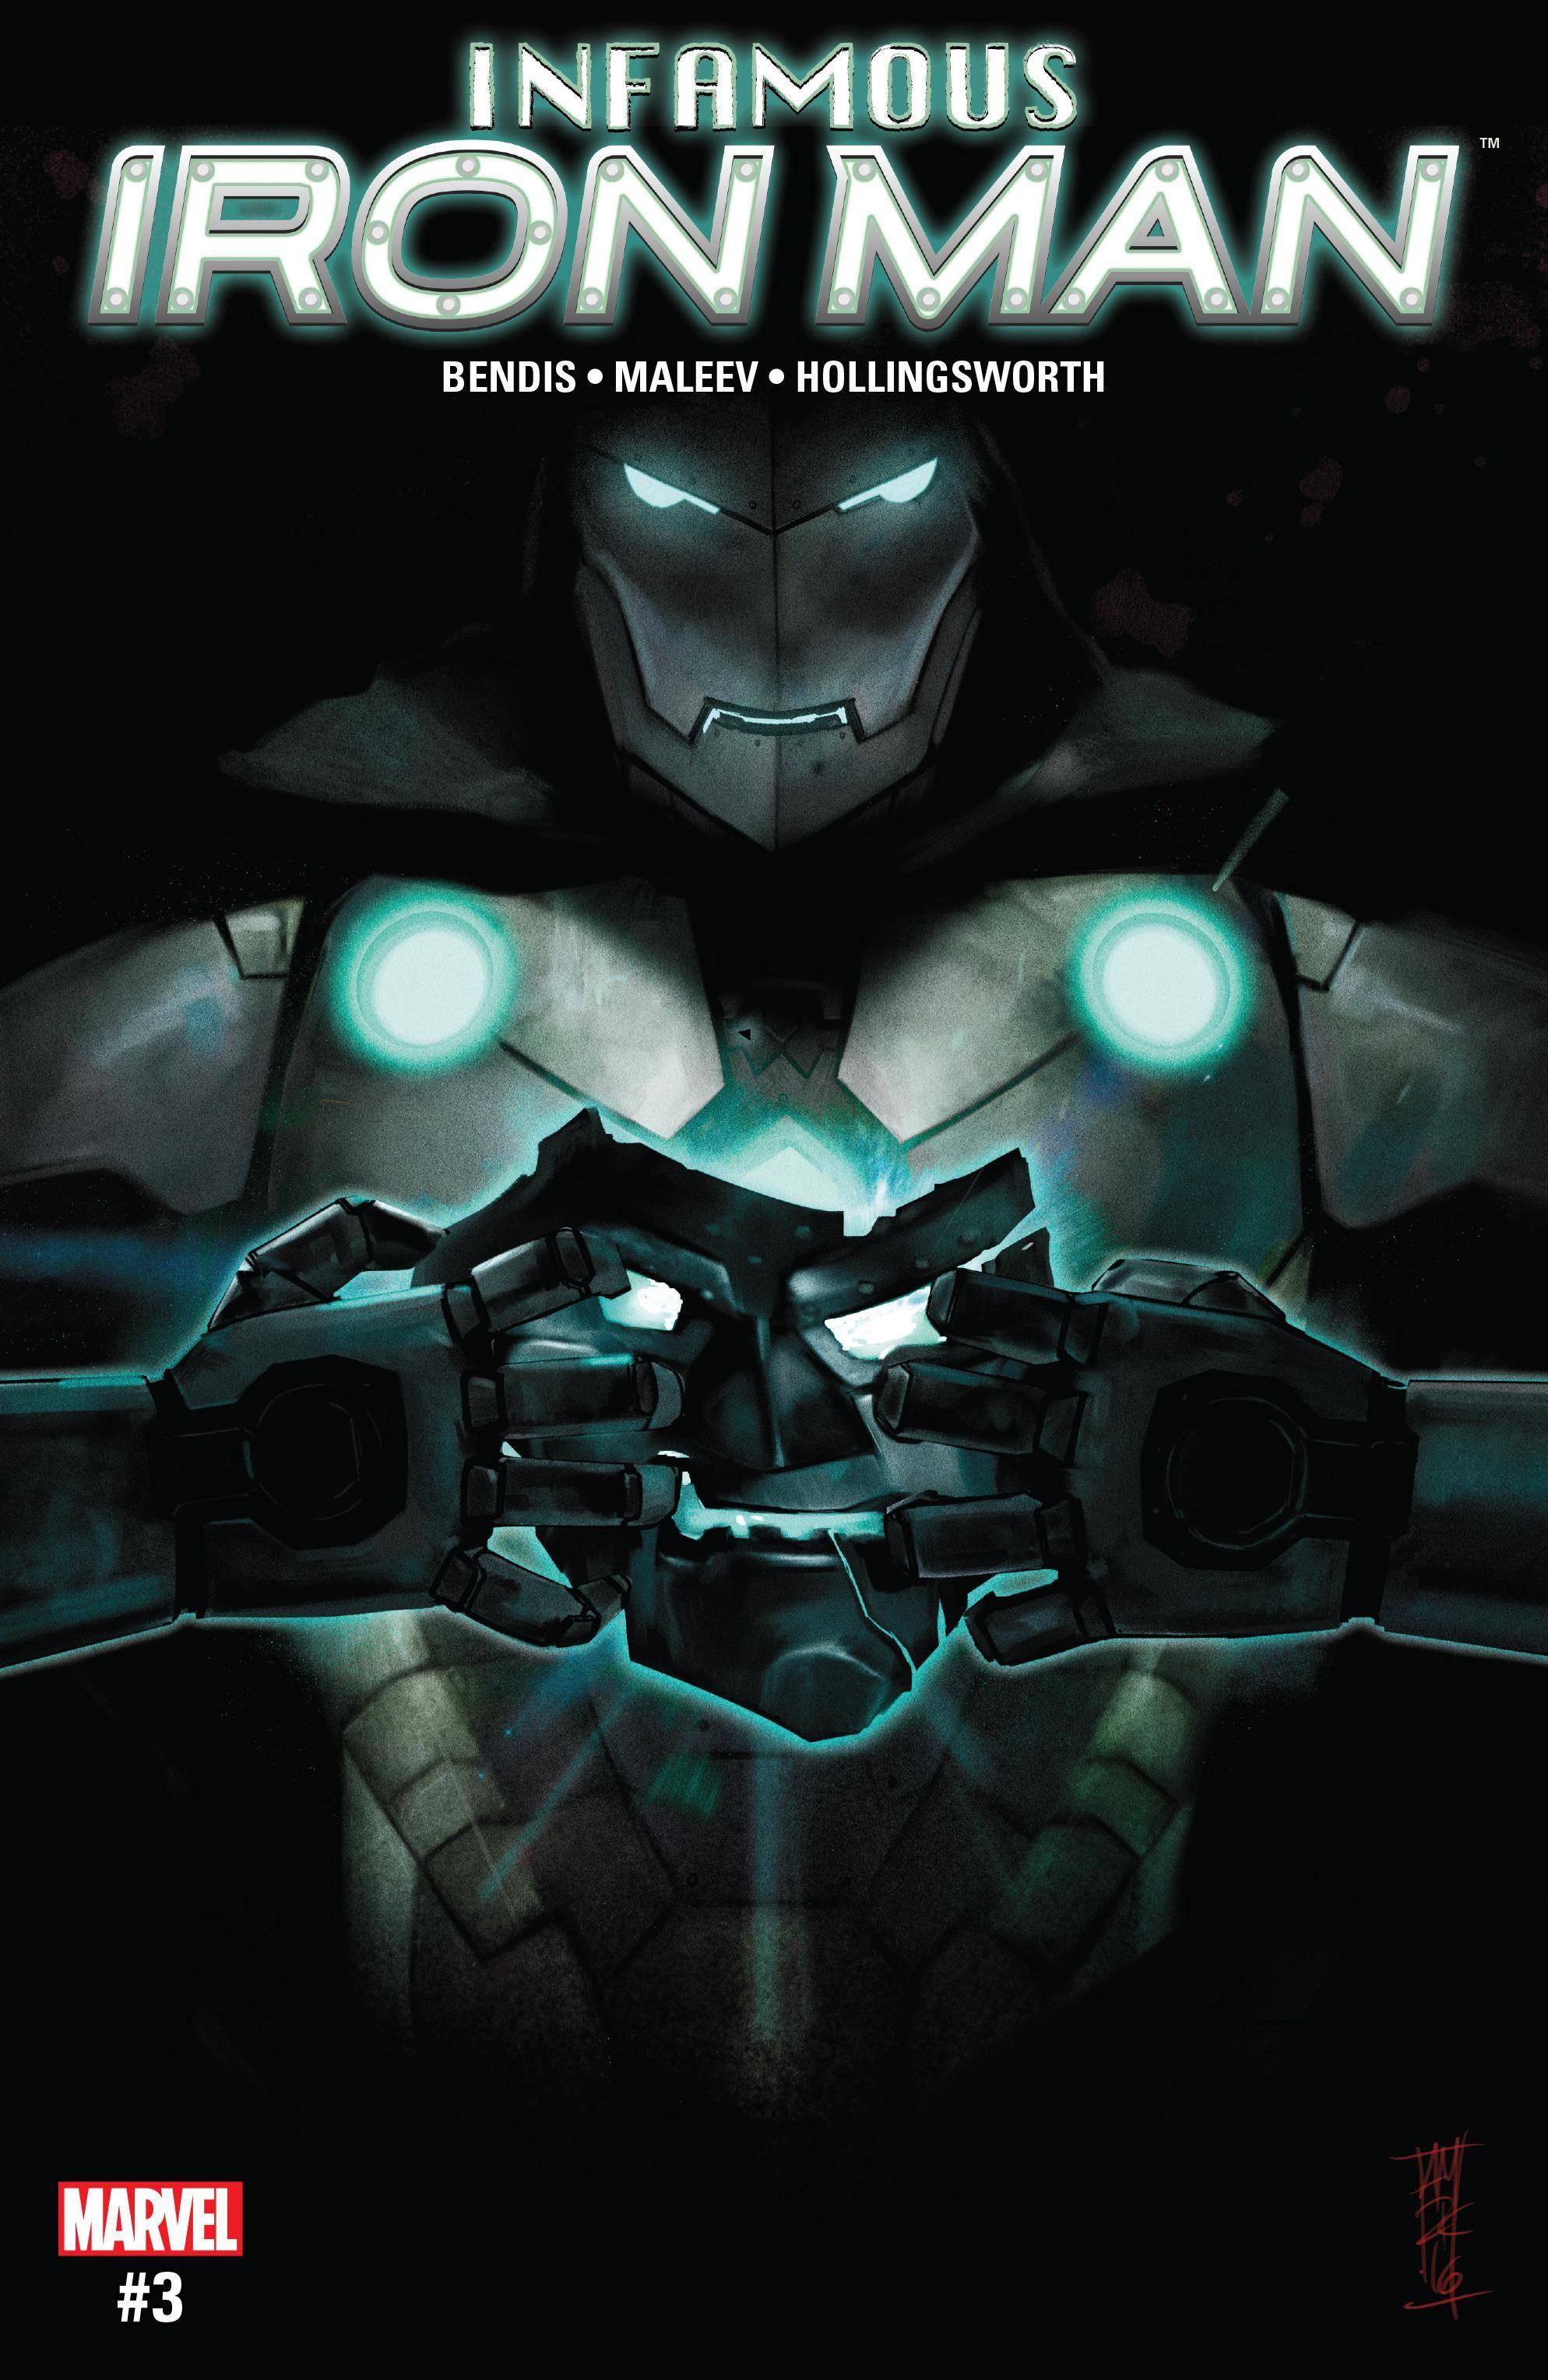 Infamous Iron Man 003 2017 Digital Zone-Empire